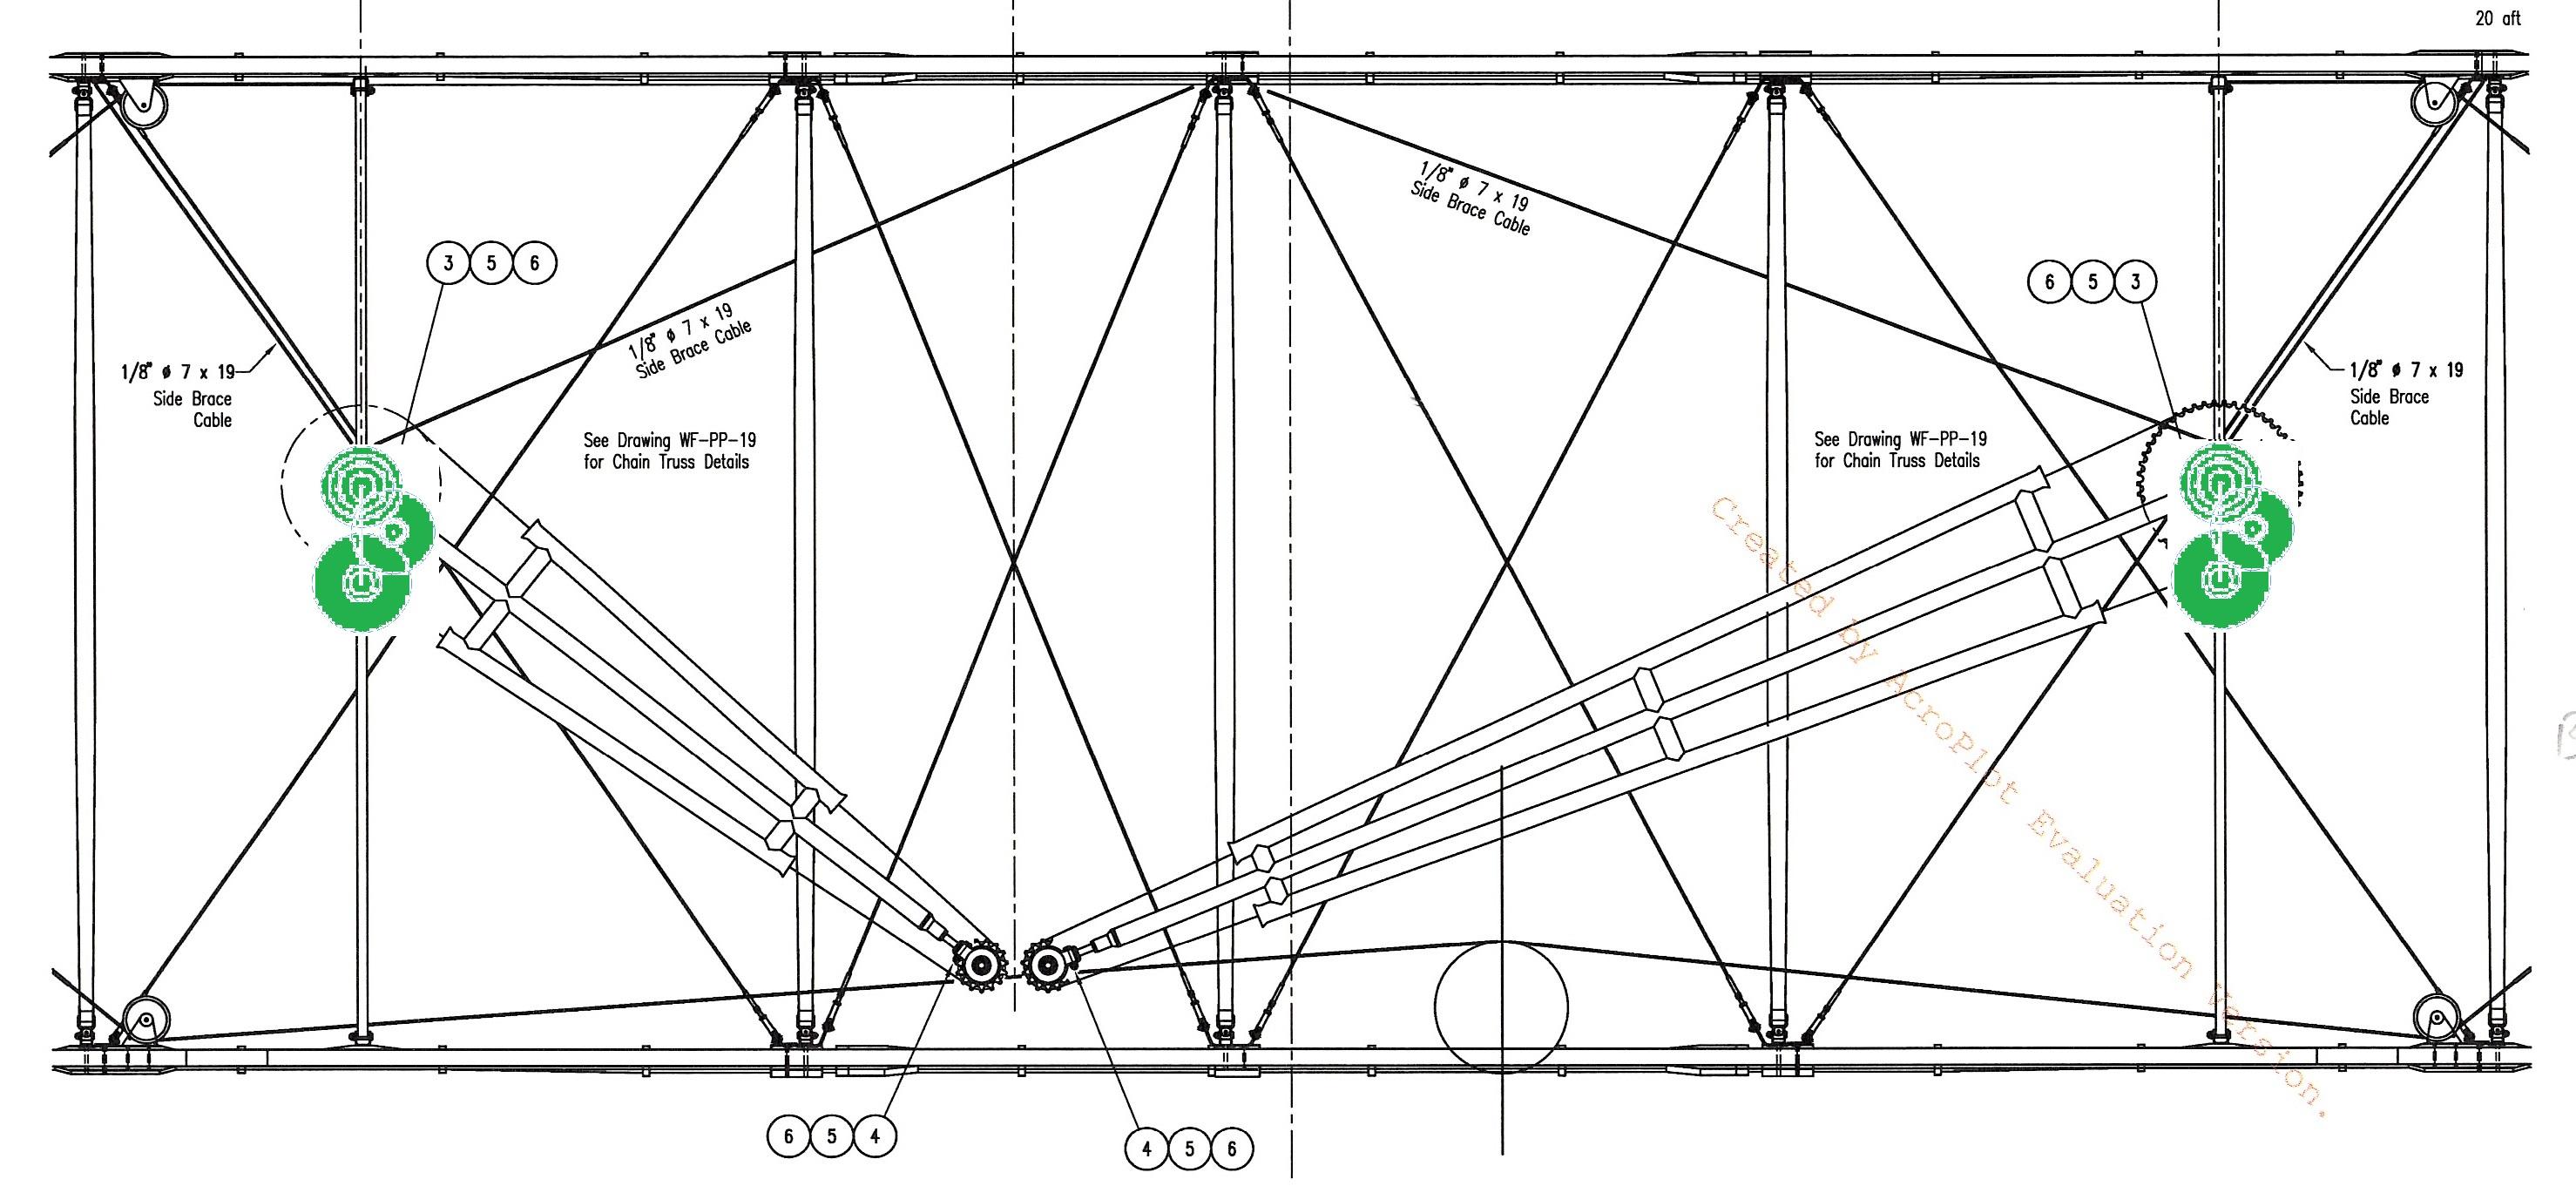 e Wright Flyer